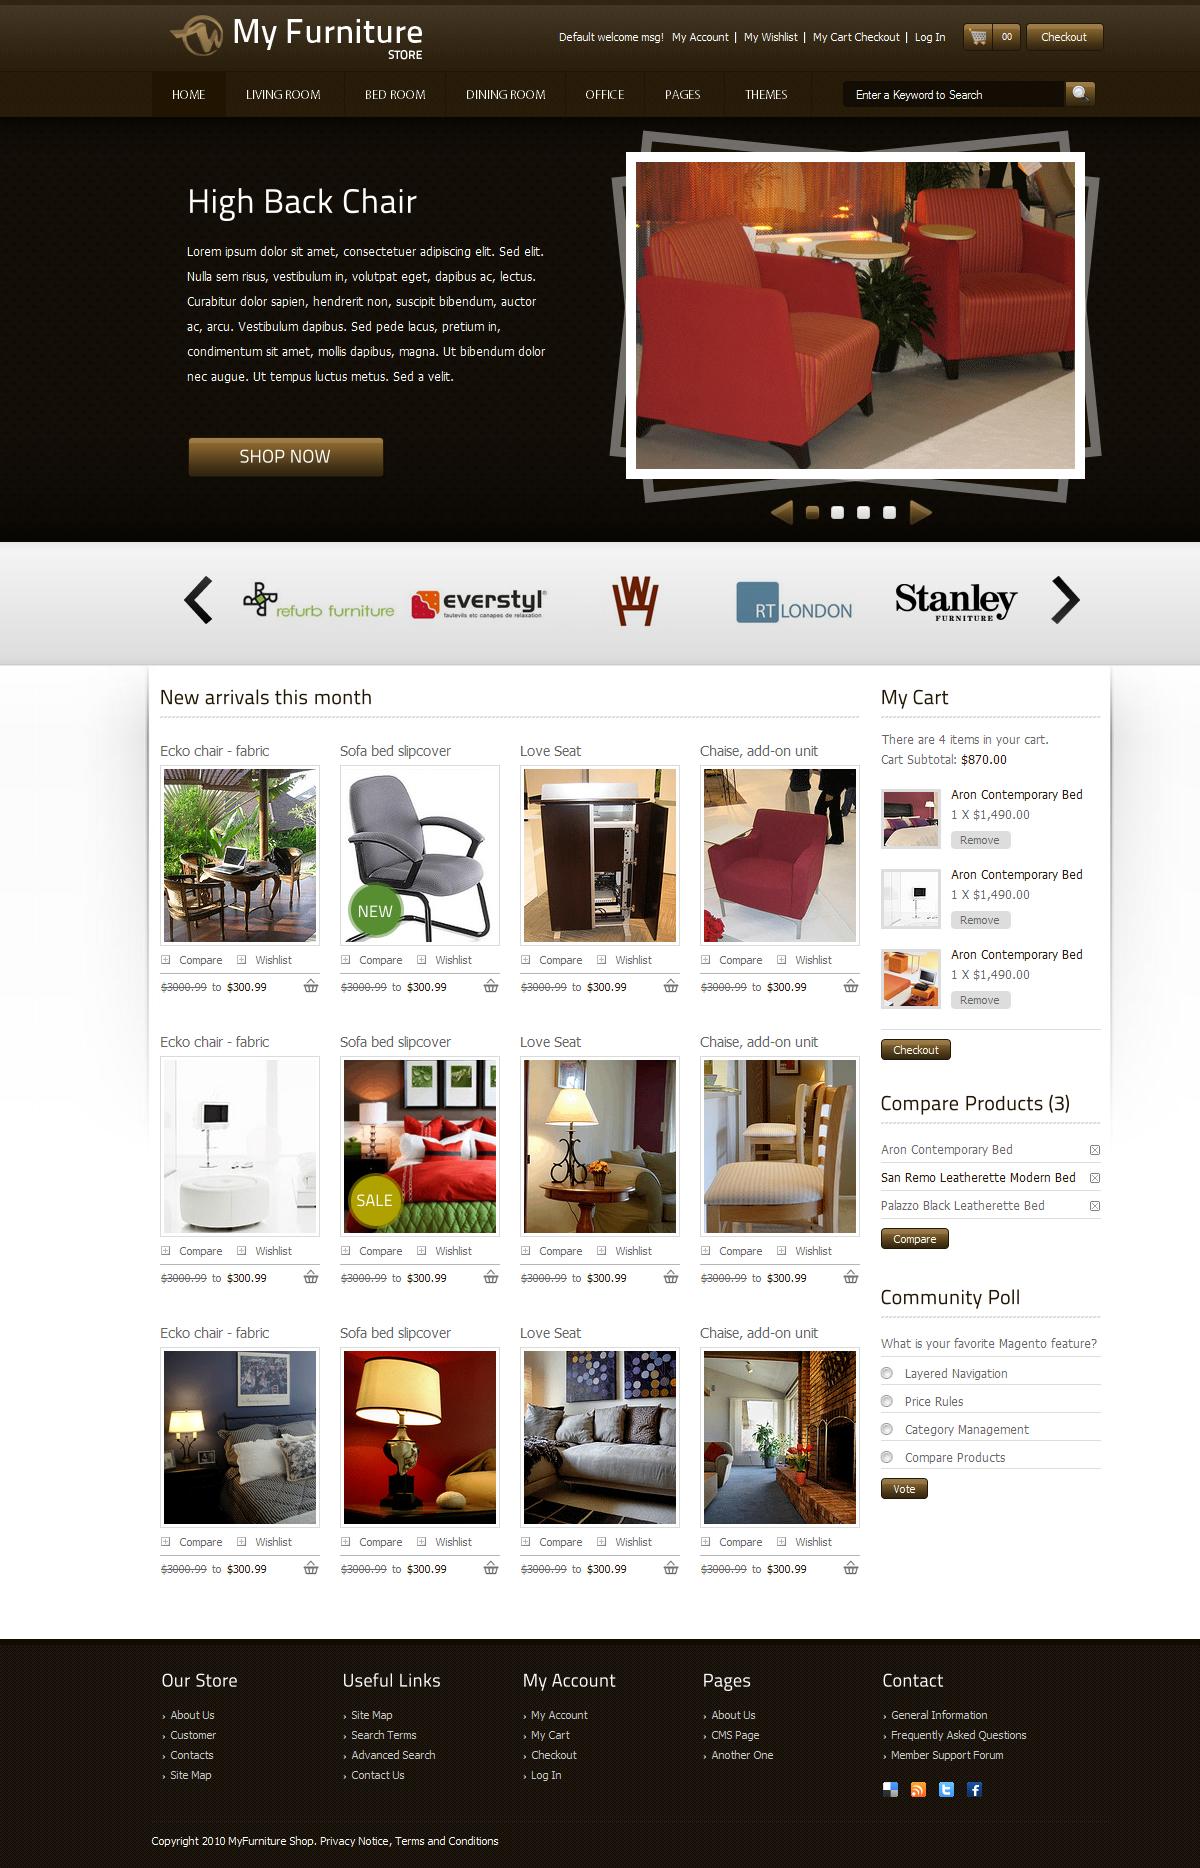 My Furniture Store